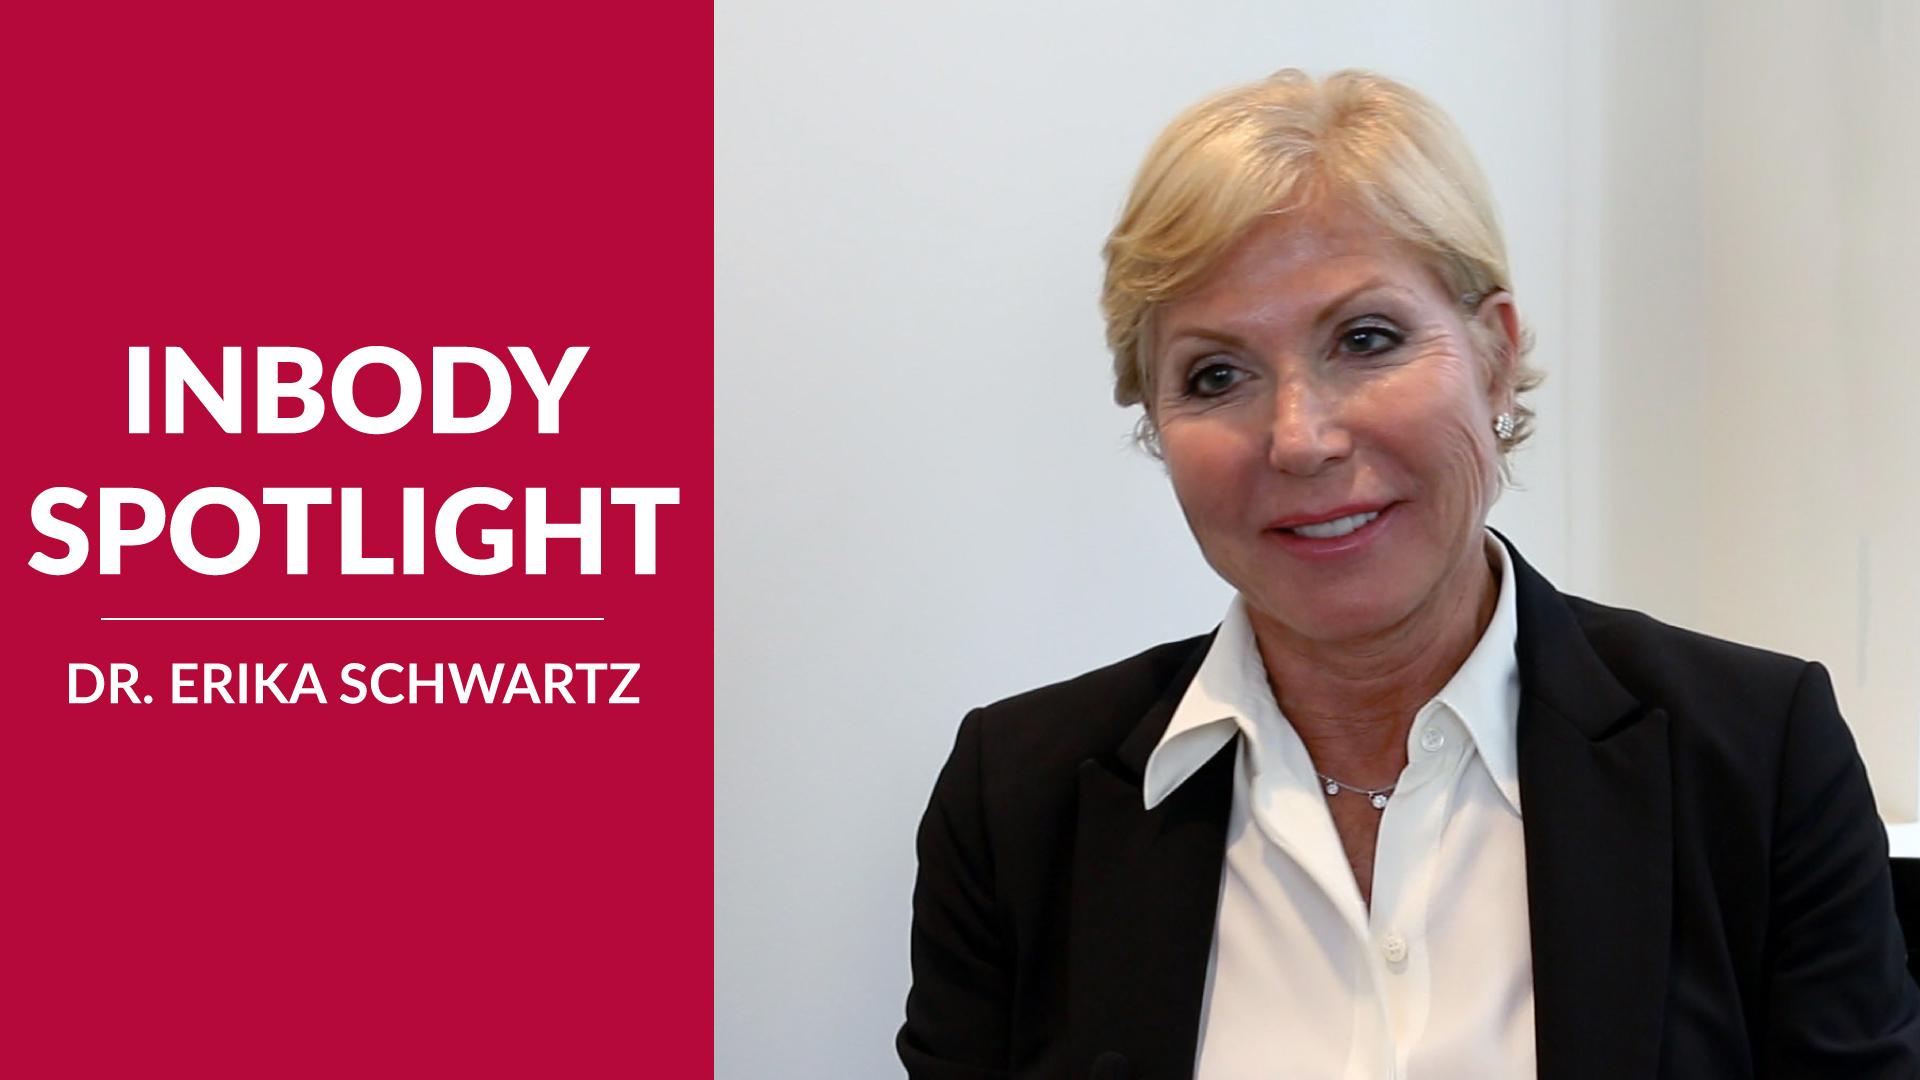 erika schwartz inbody spotlight thumbnail testimony video